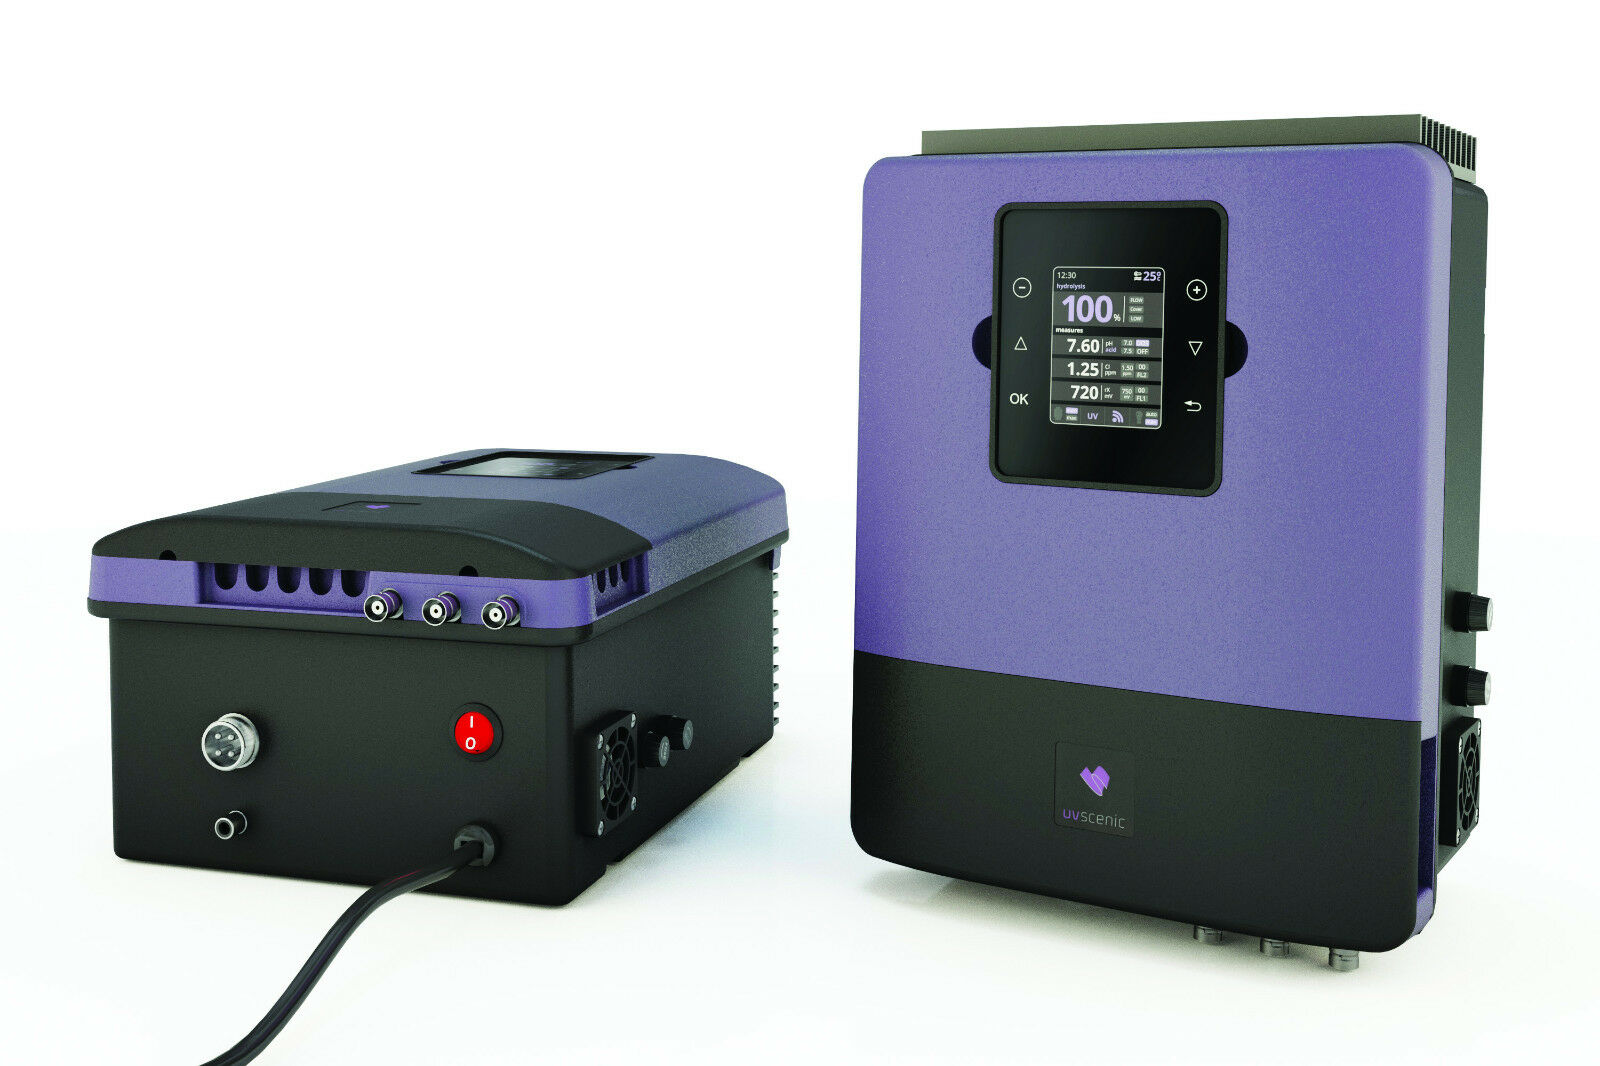 UV- und Salzelektrolyseanlage Infinity Senic, Salzwasserelektrolyseanlage